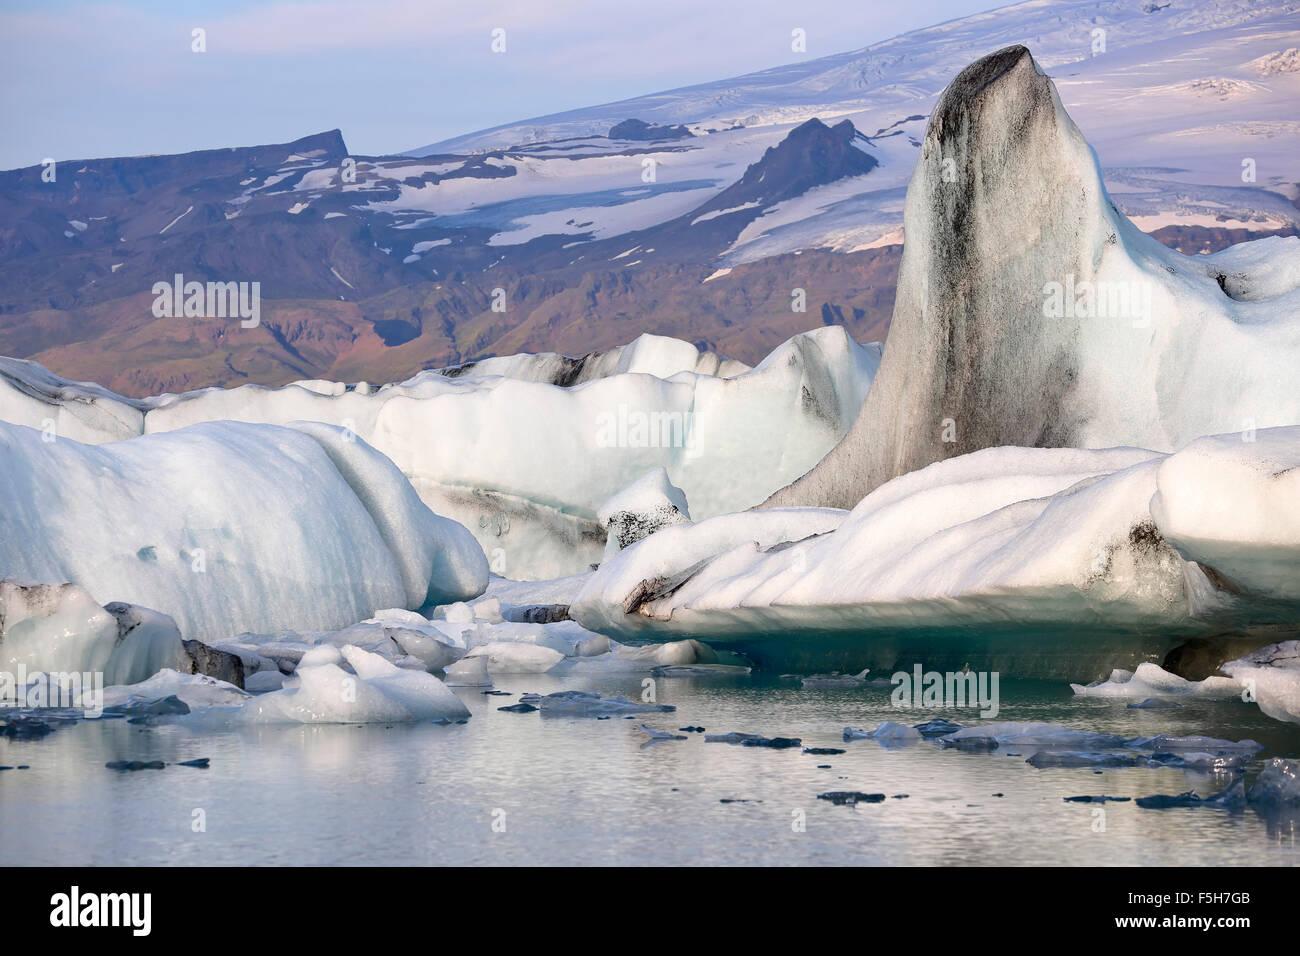 Icebergs, Jokulsarlon Glacier Lagoon, southern edge of Vatnajokull Glacier, Vatnajokull National Park, Iceland - Stock Image